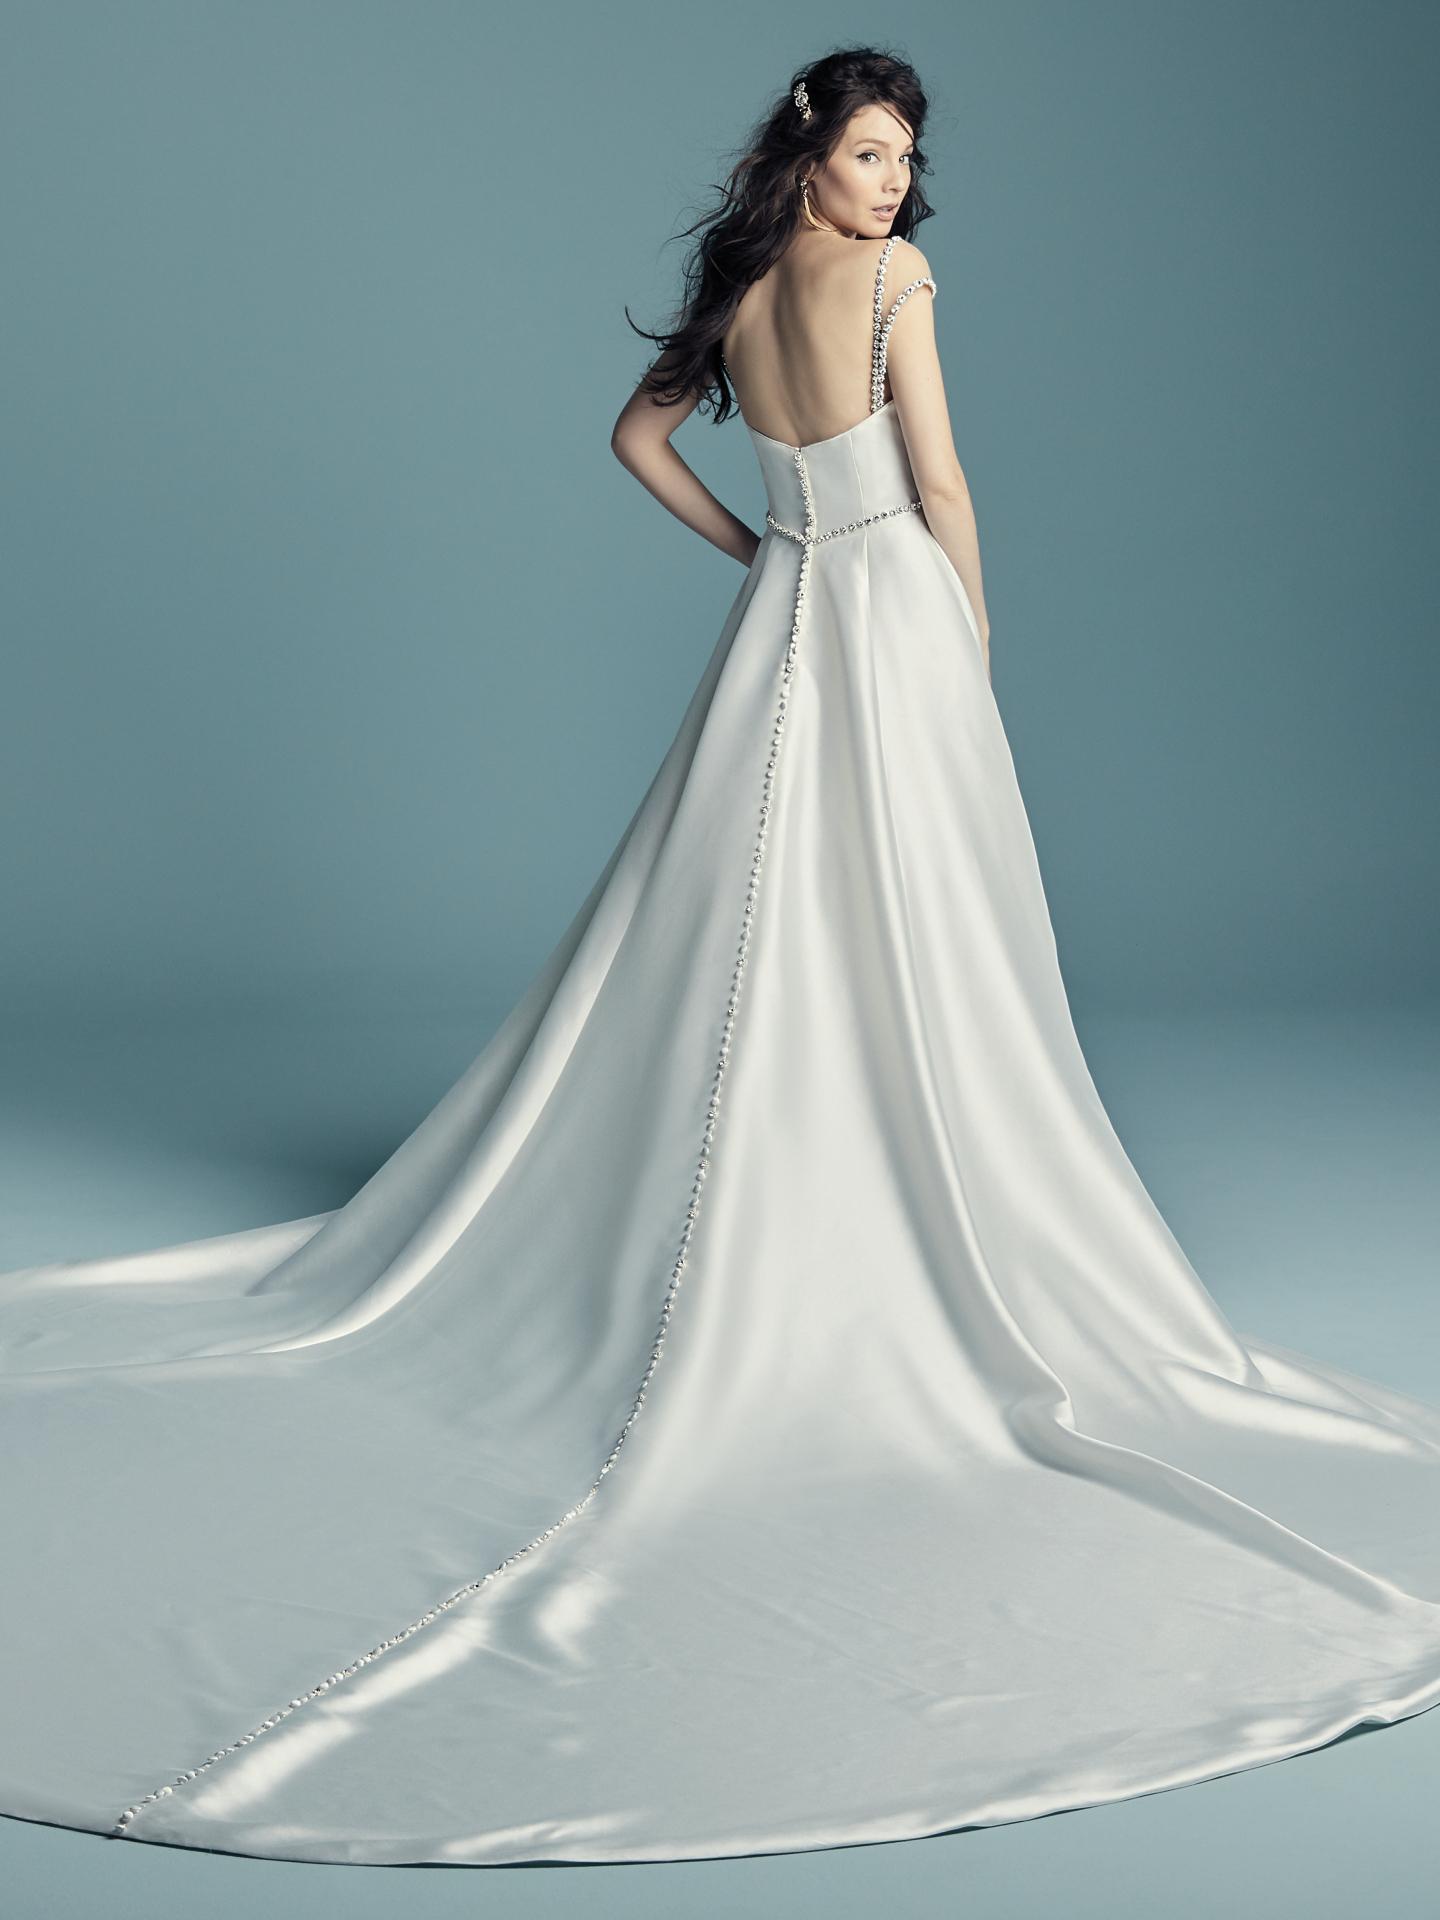 Silk and Silk Wedding Dress Alternatives For The Glamorous Bride ...